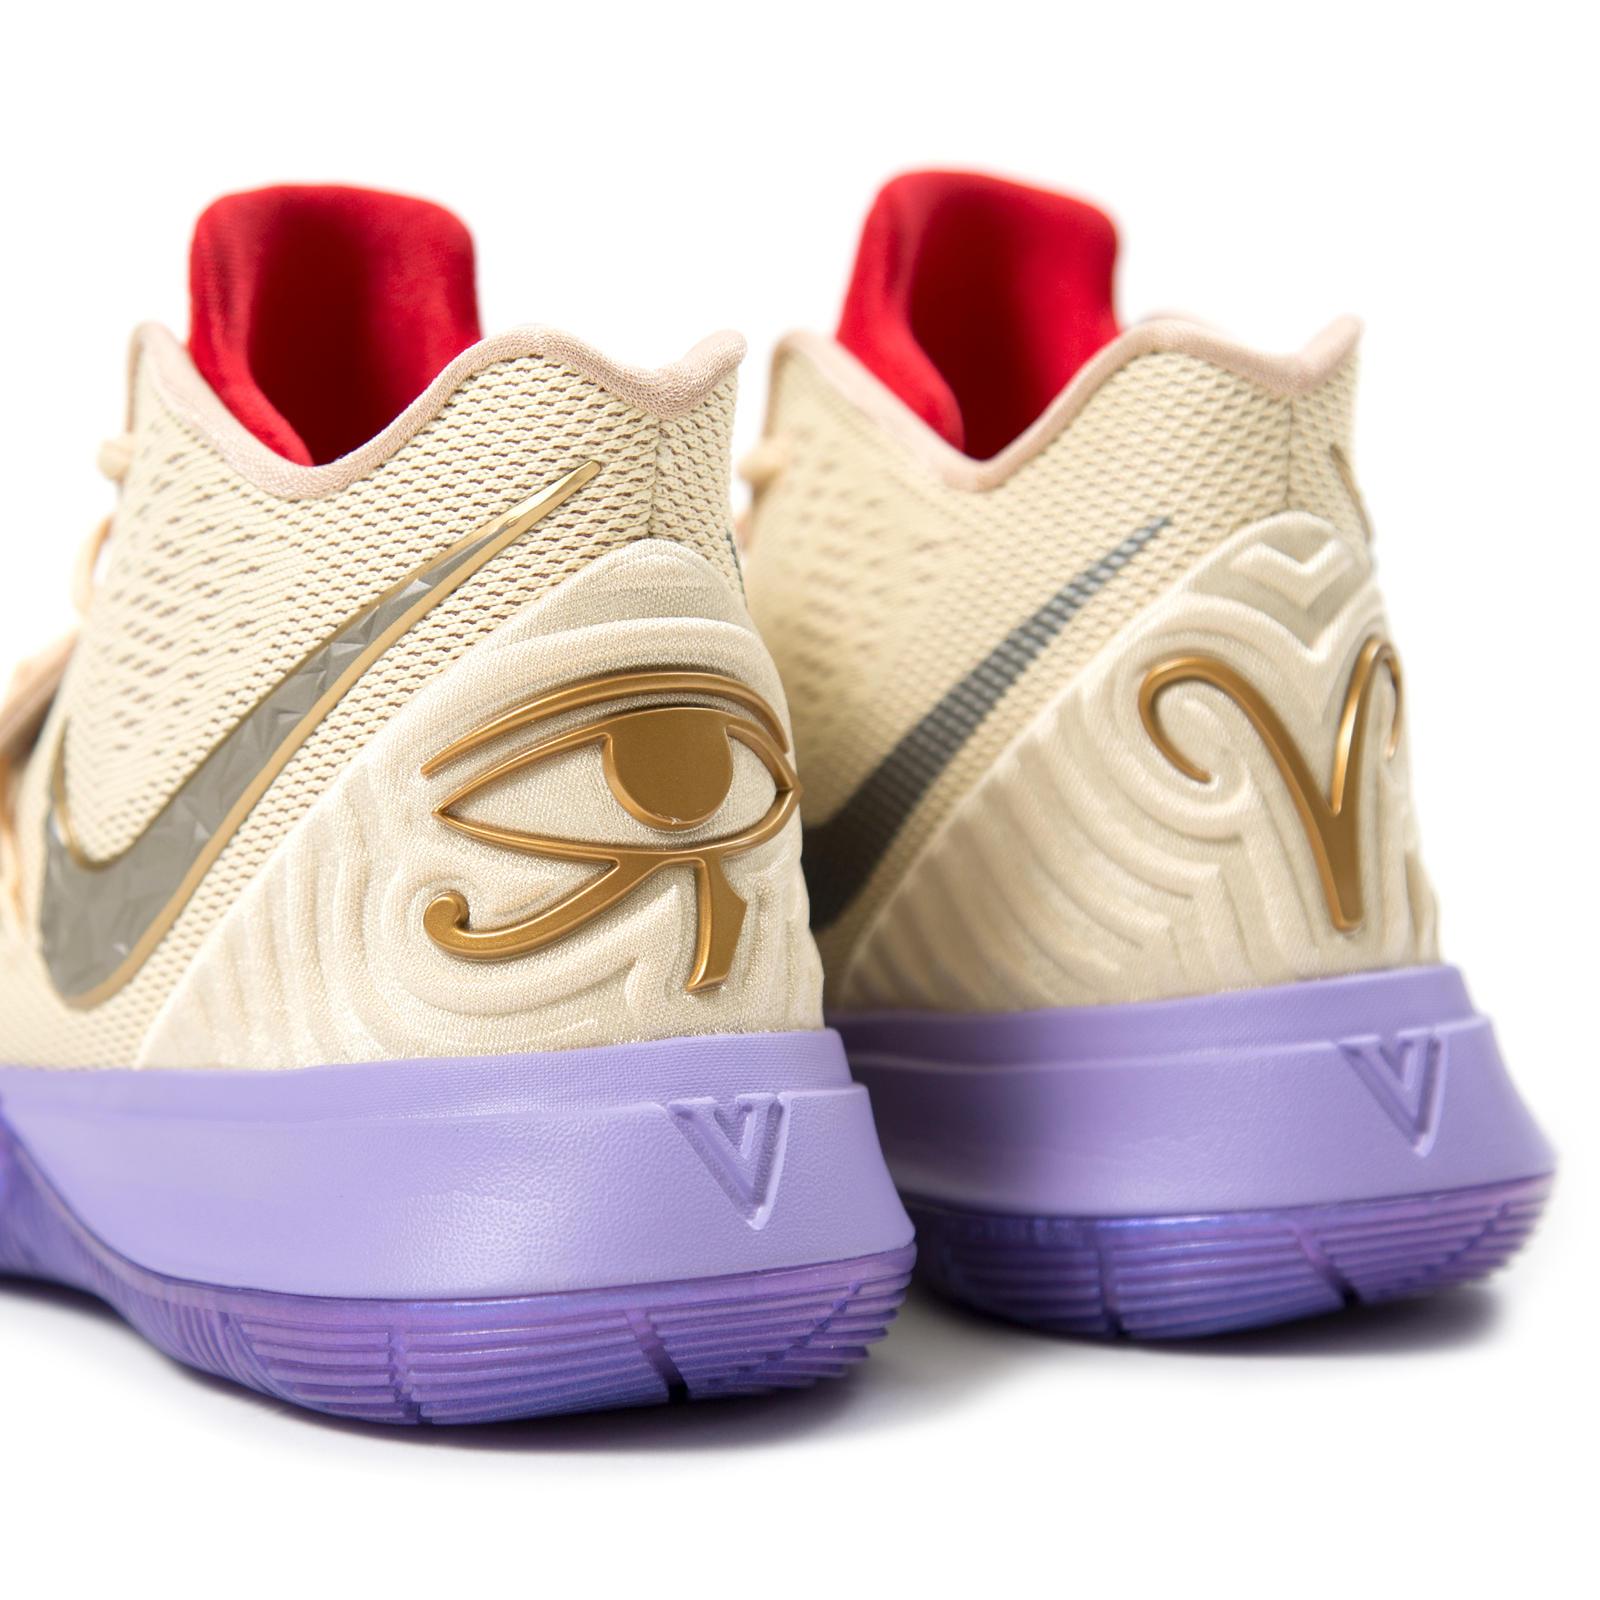 Concepts x KYRIE 5 Ikhet - Nike News